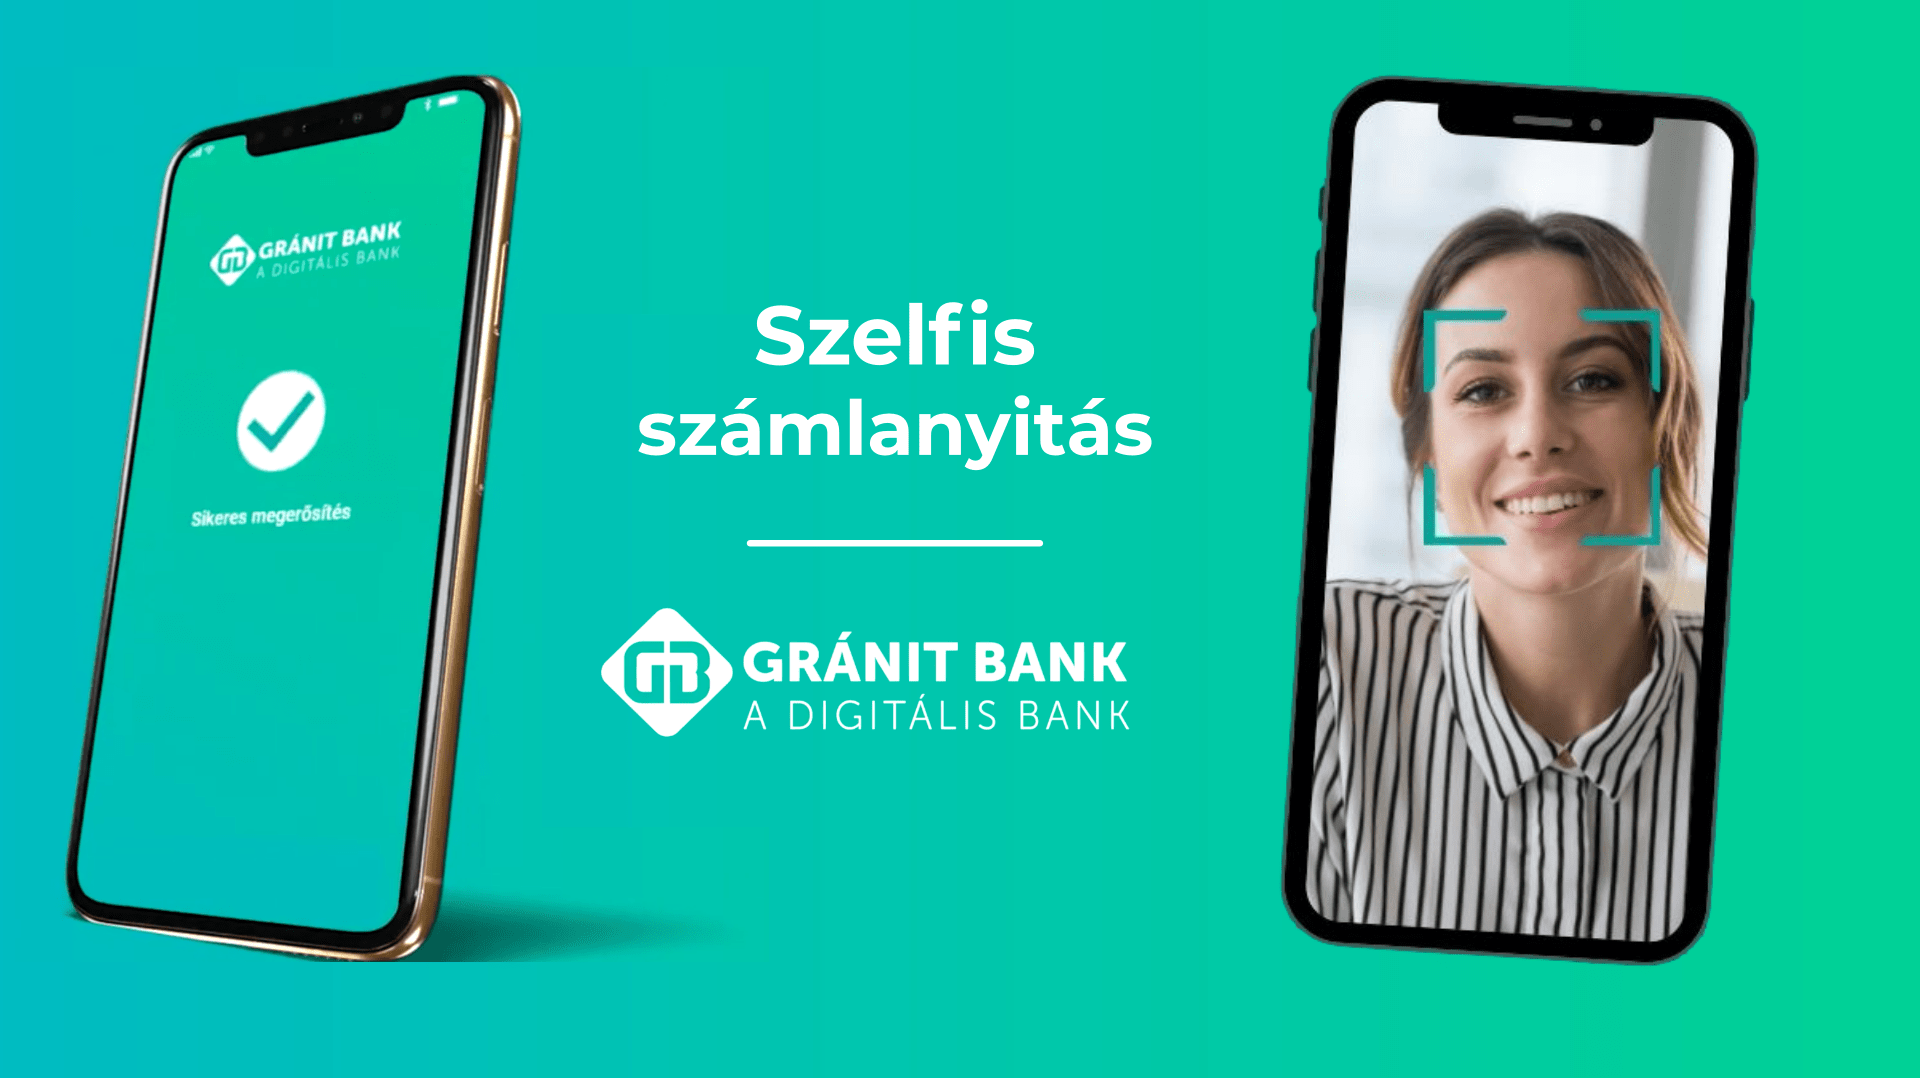 granit-bank-szelfis-szamlanyitas-cover-min